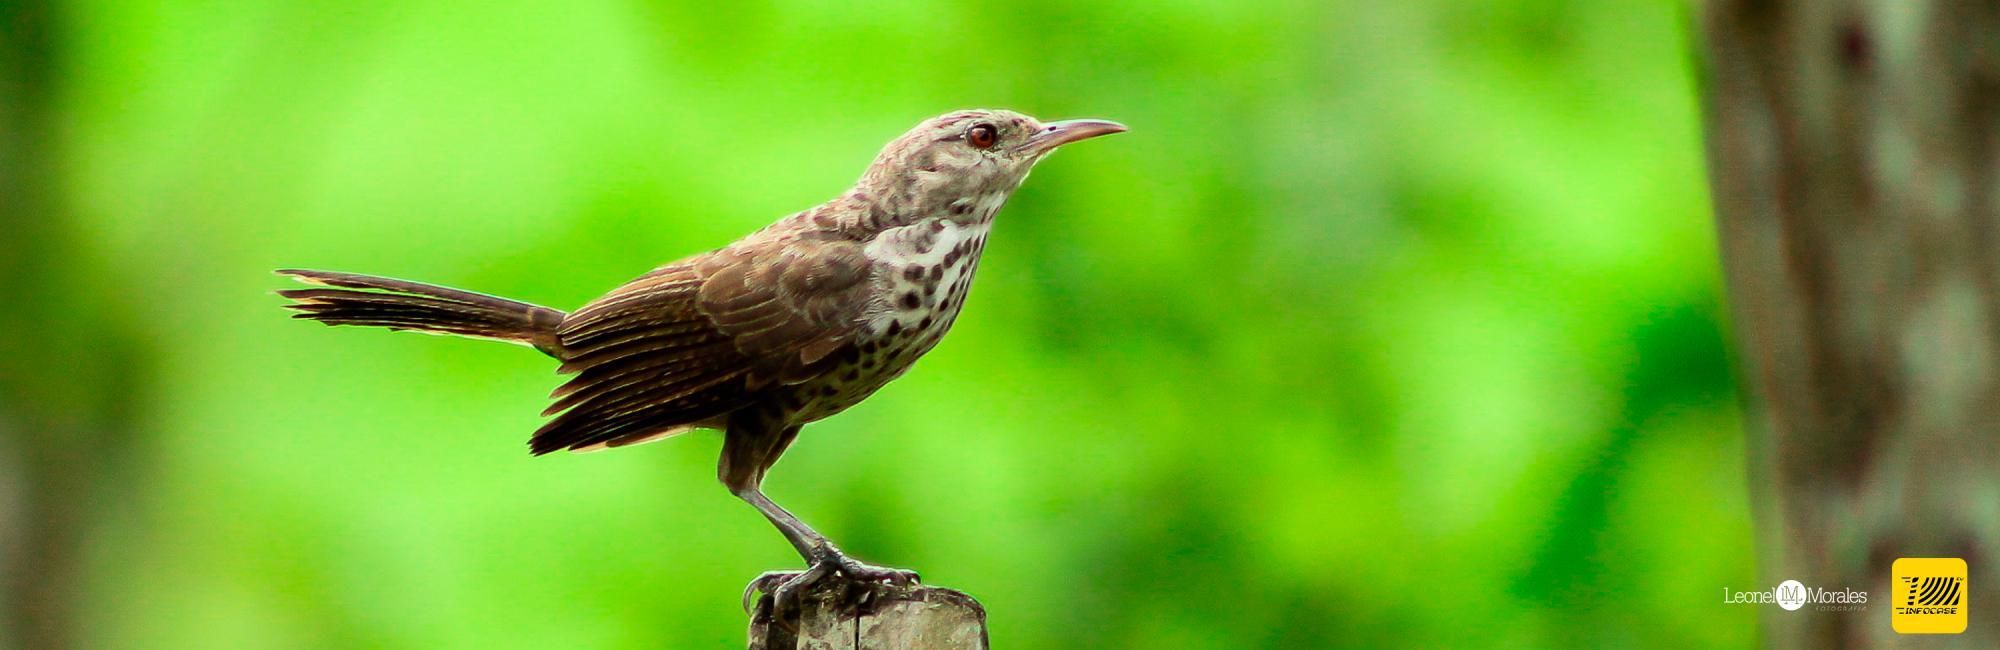 Birdwatching for You to Enjoy